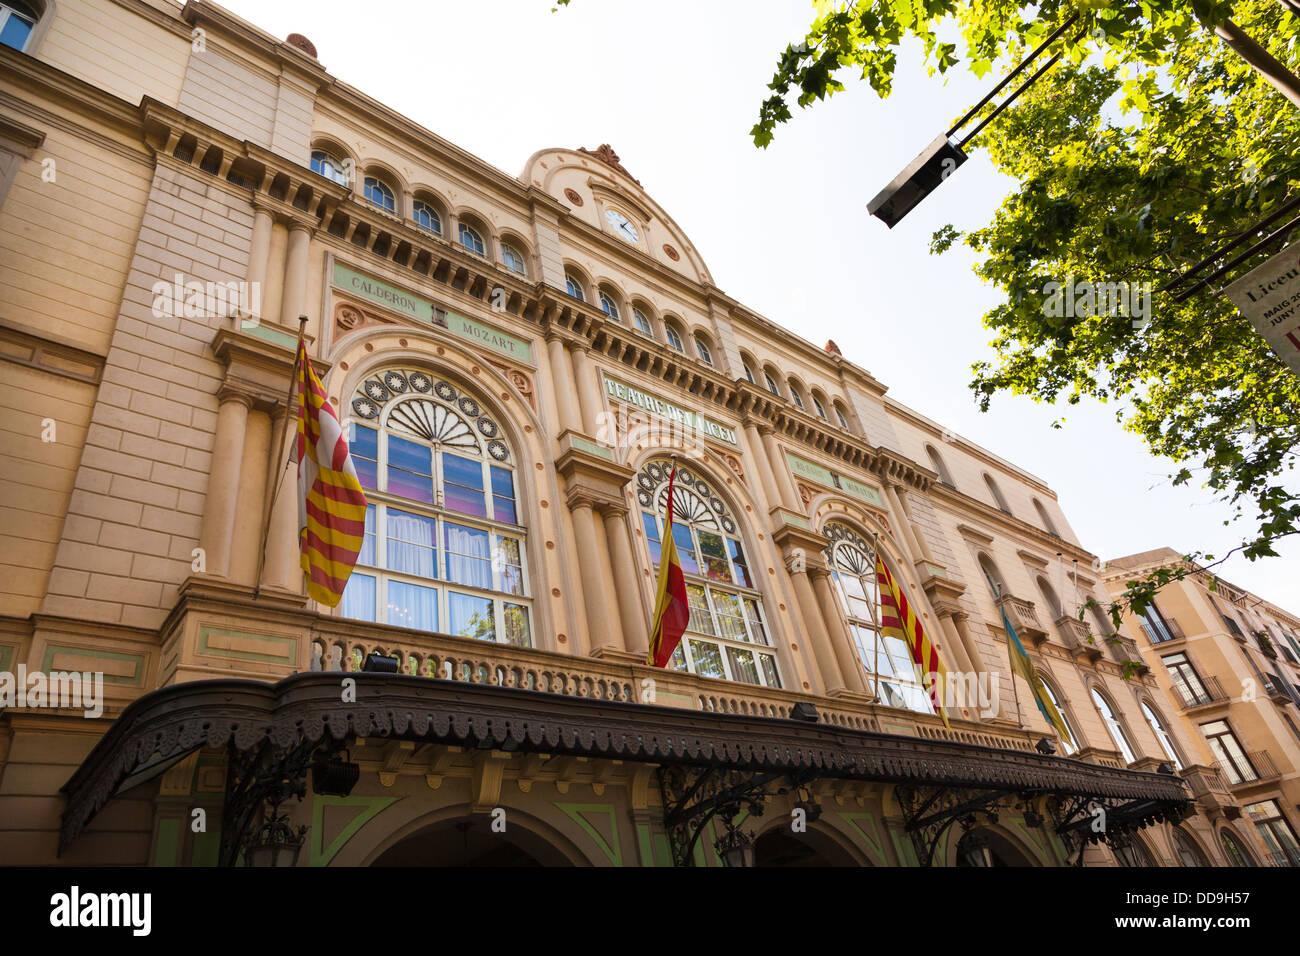 Teatre Delliceu exterior in La Rambla Barcelona - Stock Image